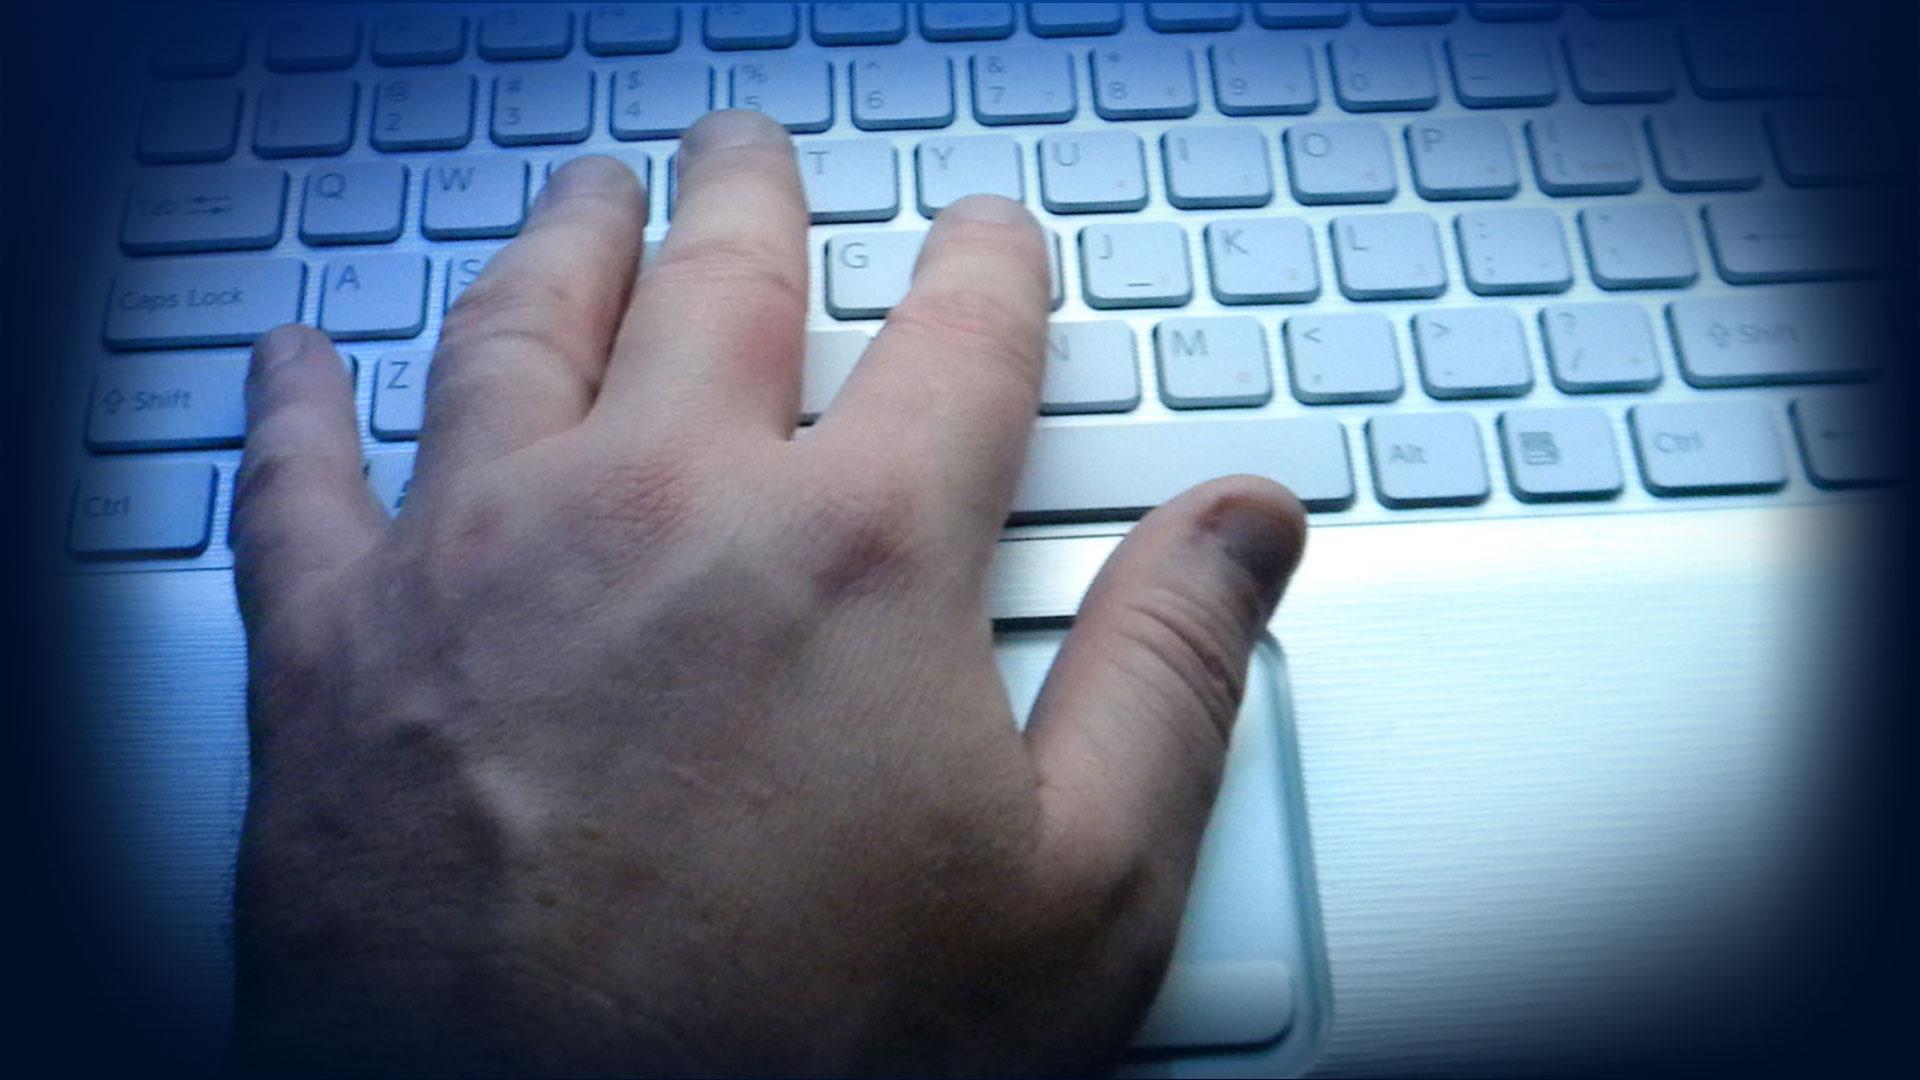 KELO Computer Hand